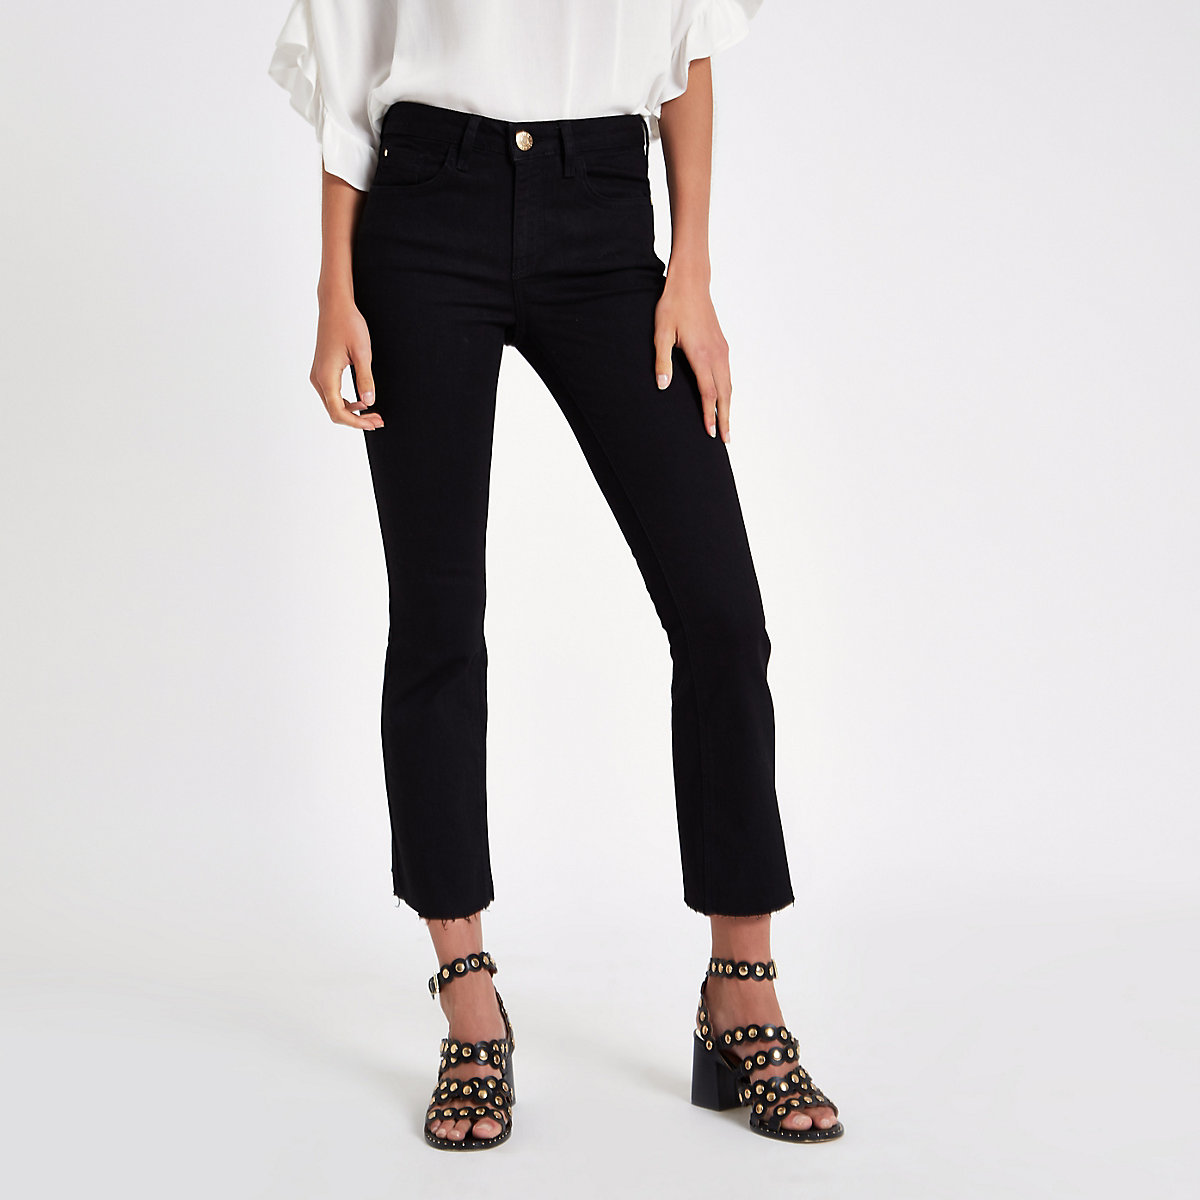 Black denim cropped flared jeans